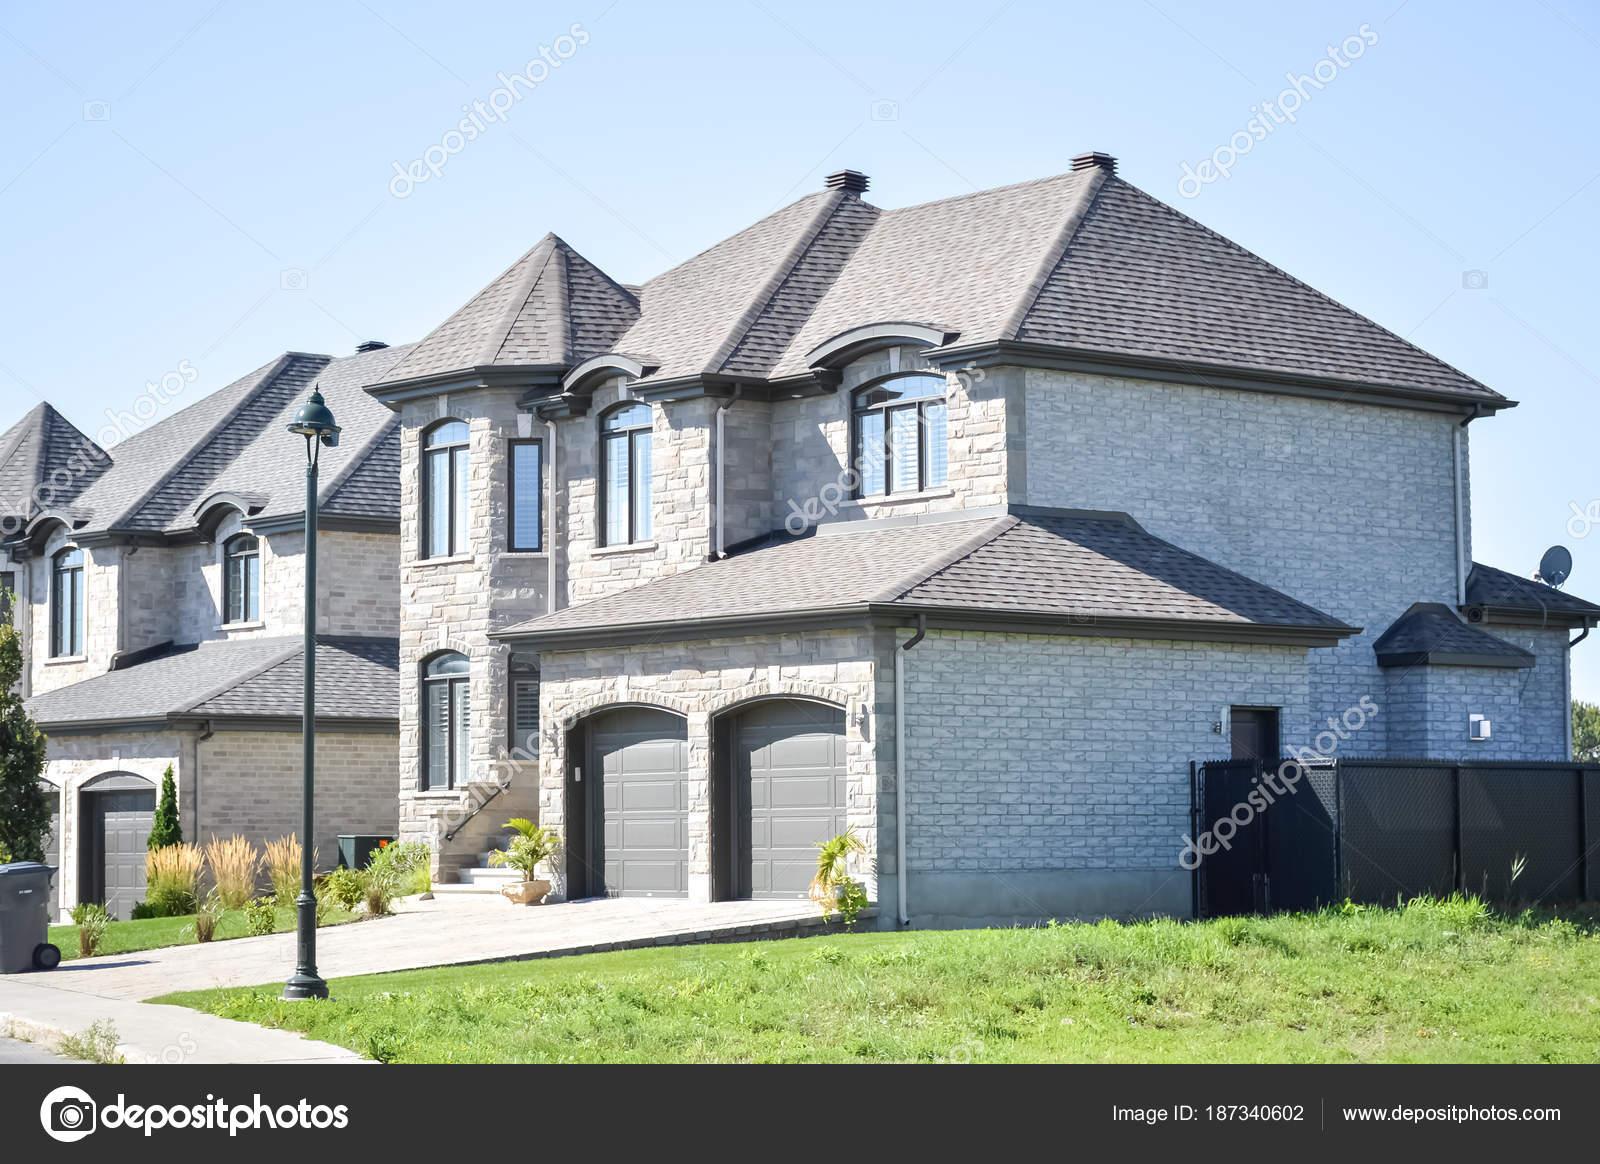 Bakerjarvis 187340602 for Villa de luxe canada